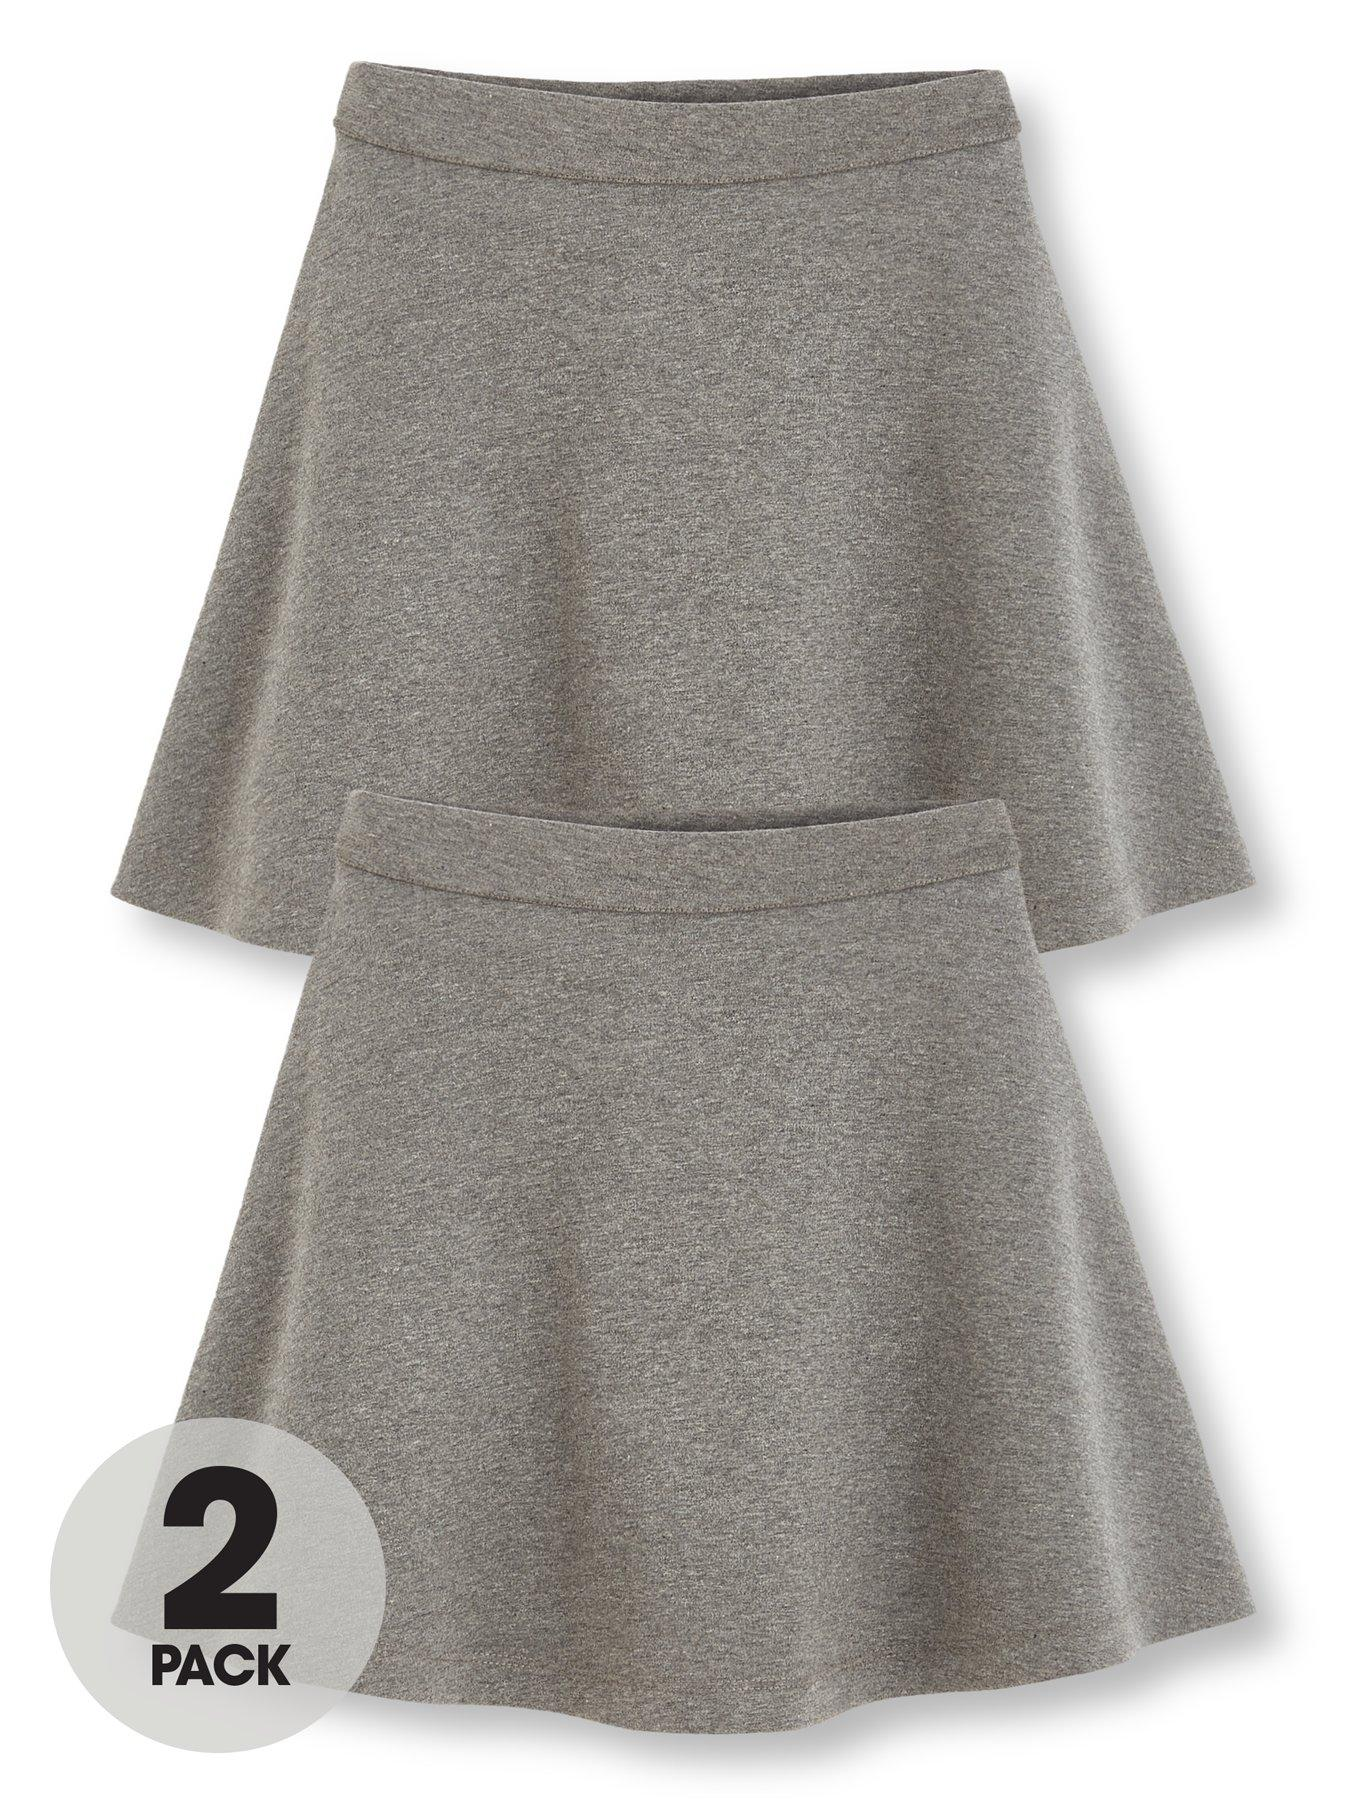 Girls Ladies Mini Skater Skirt Age 10 11 12 13 14 15 UK 4 6 8 10 12 FREE P/&P